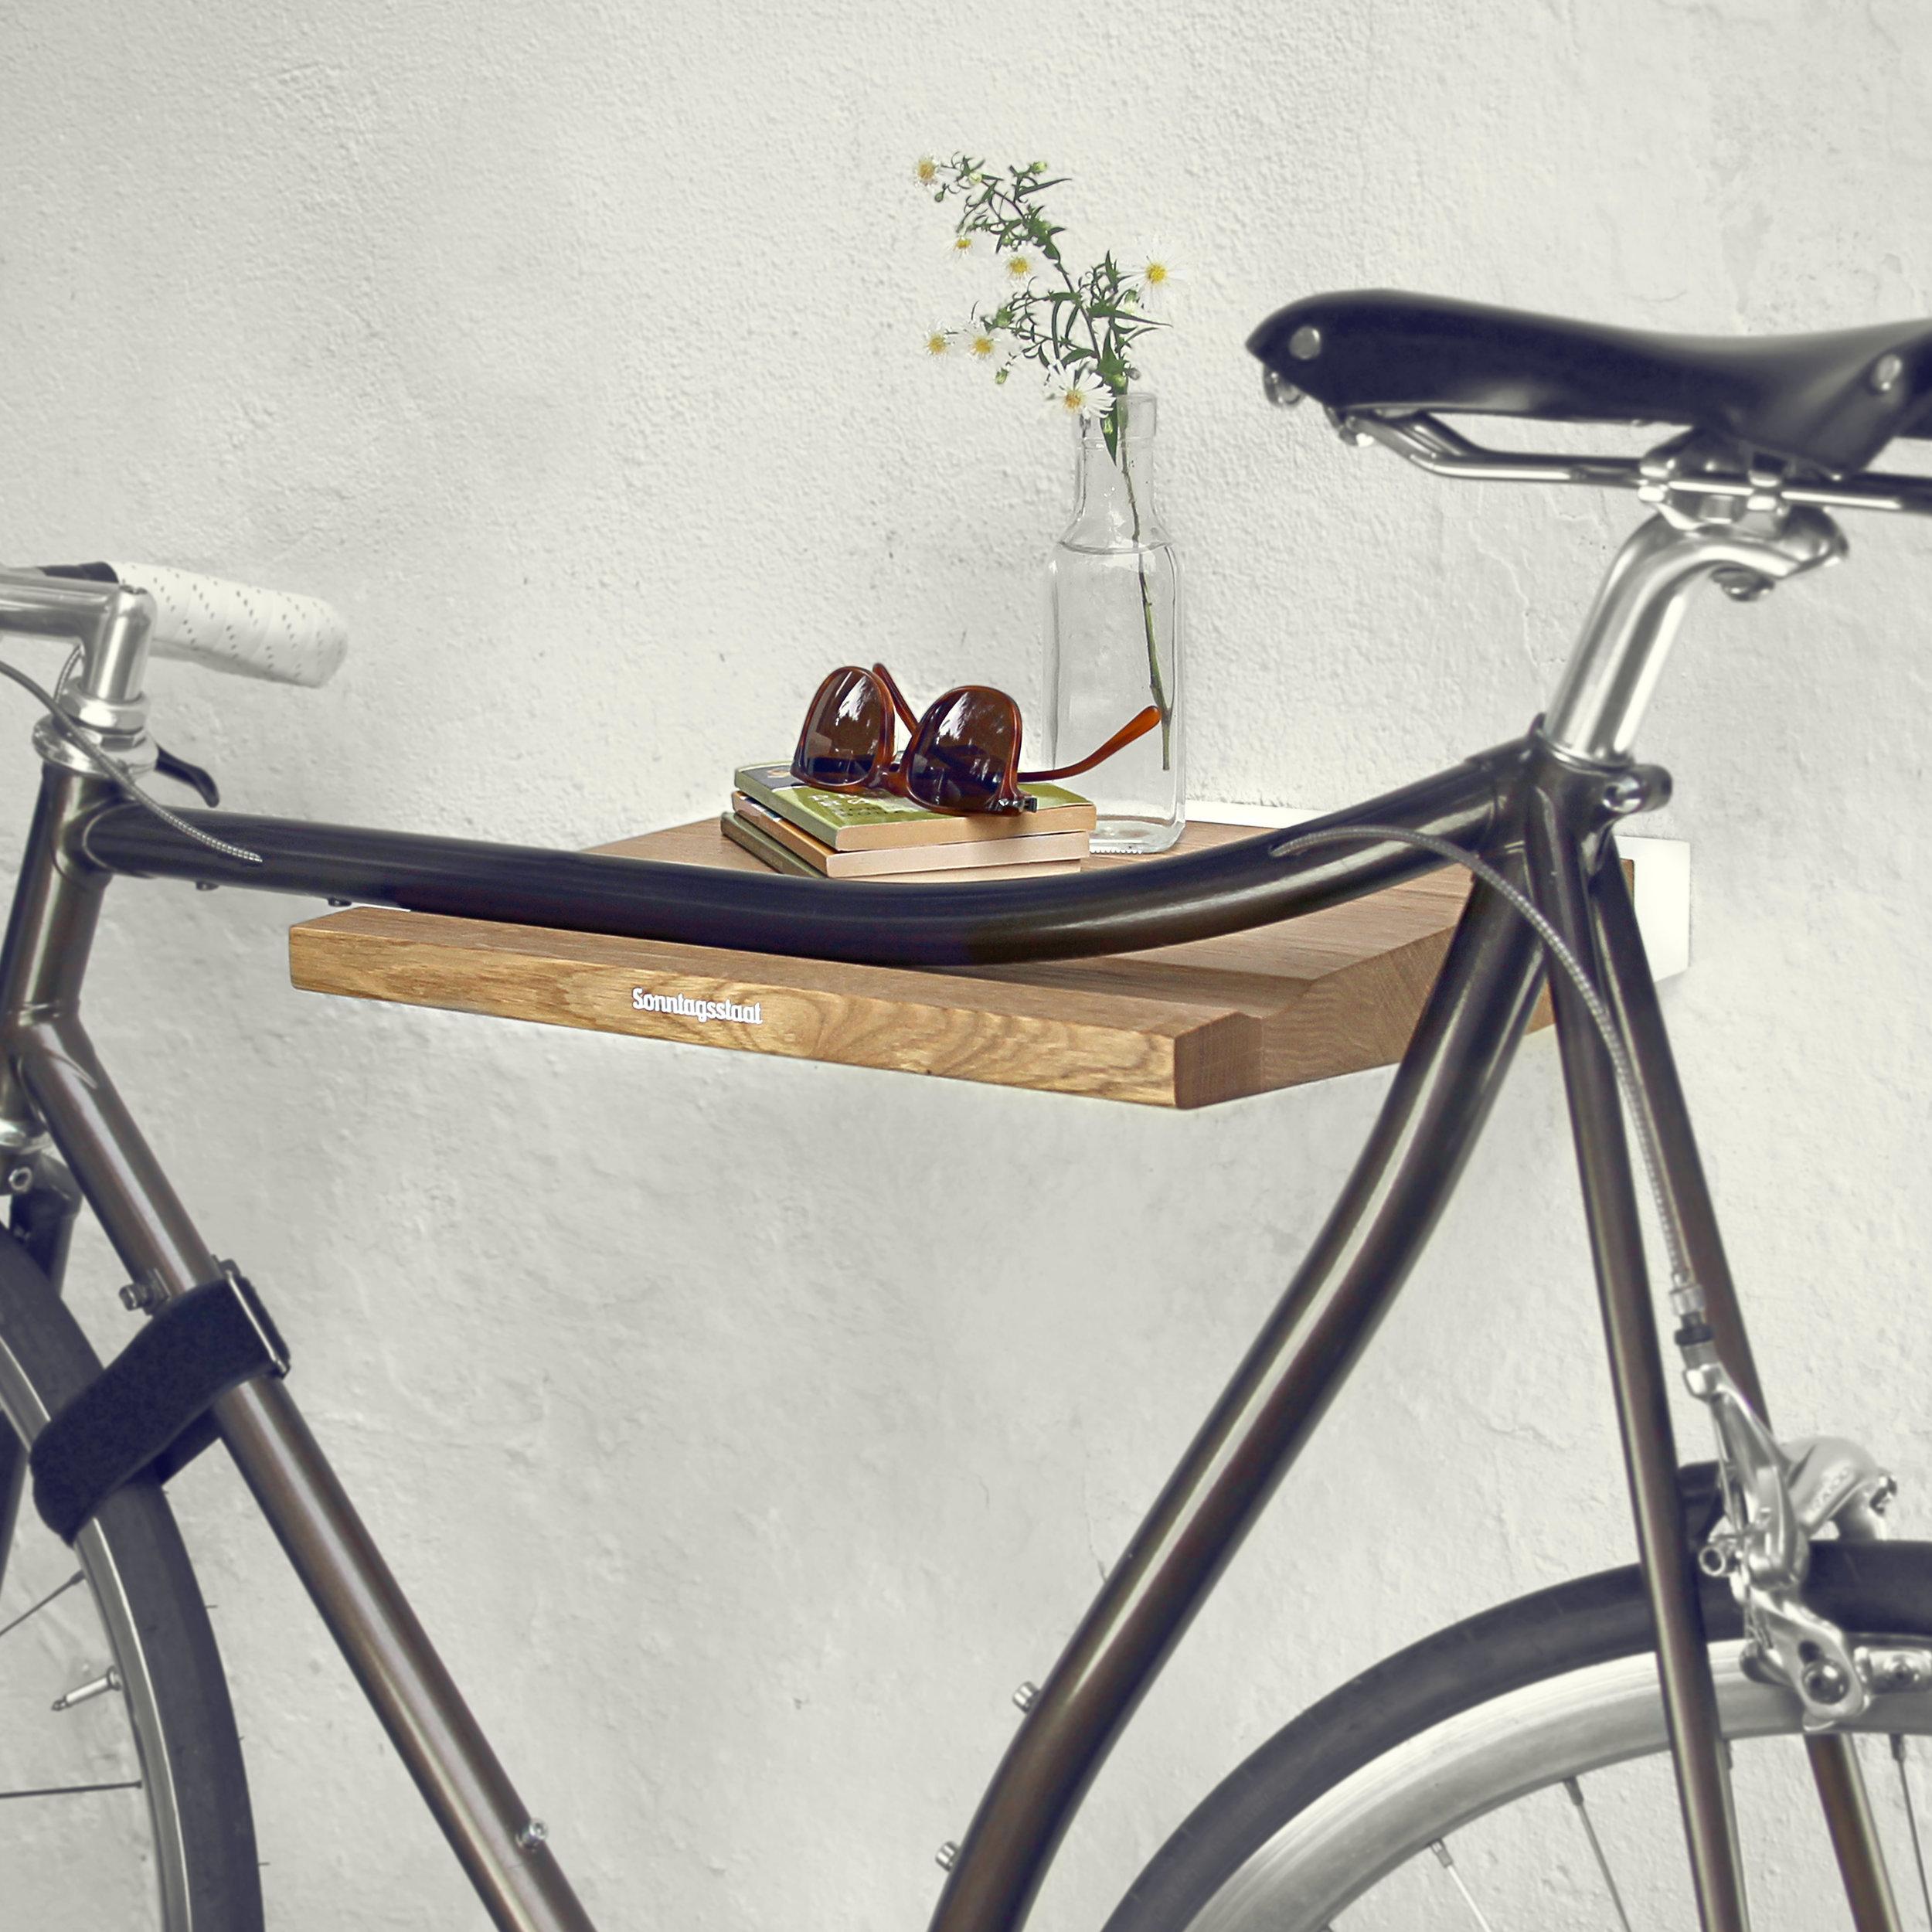 Sonntagsstaat-BikeBoard_mood_300.jpg